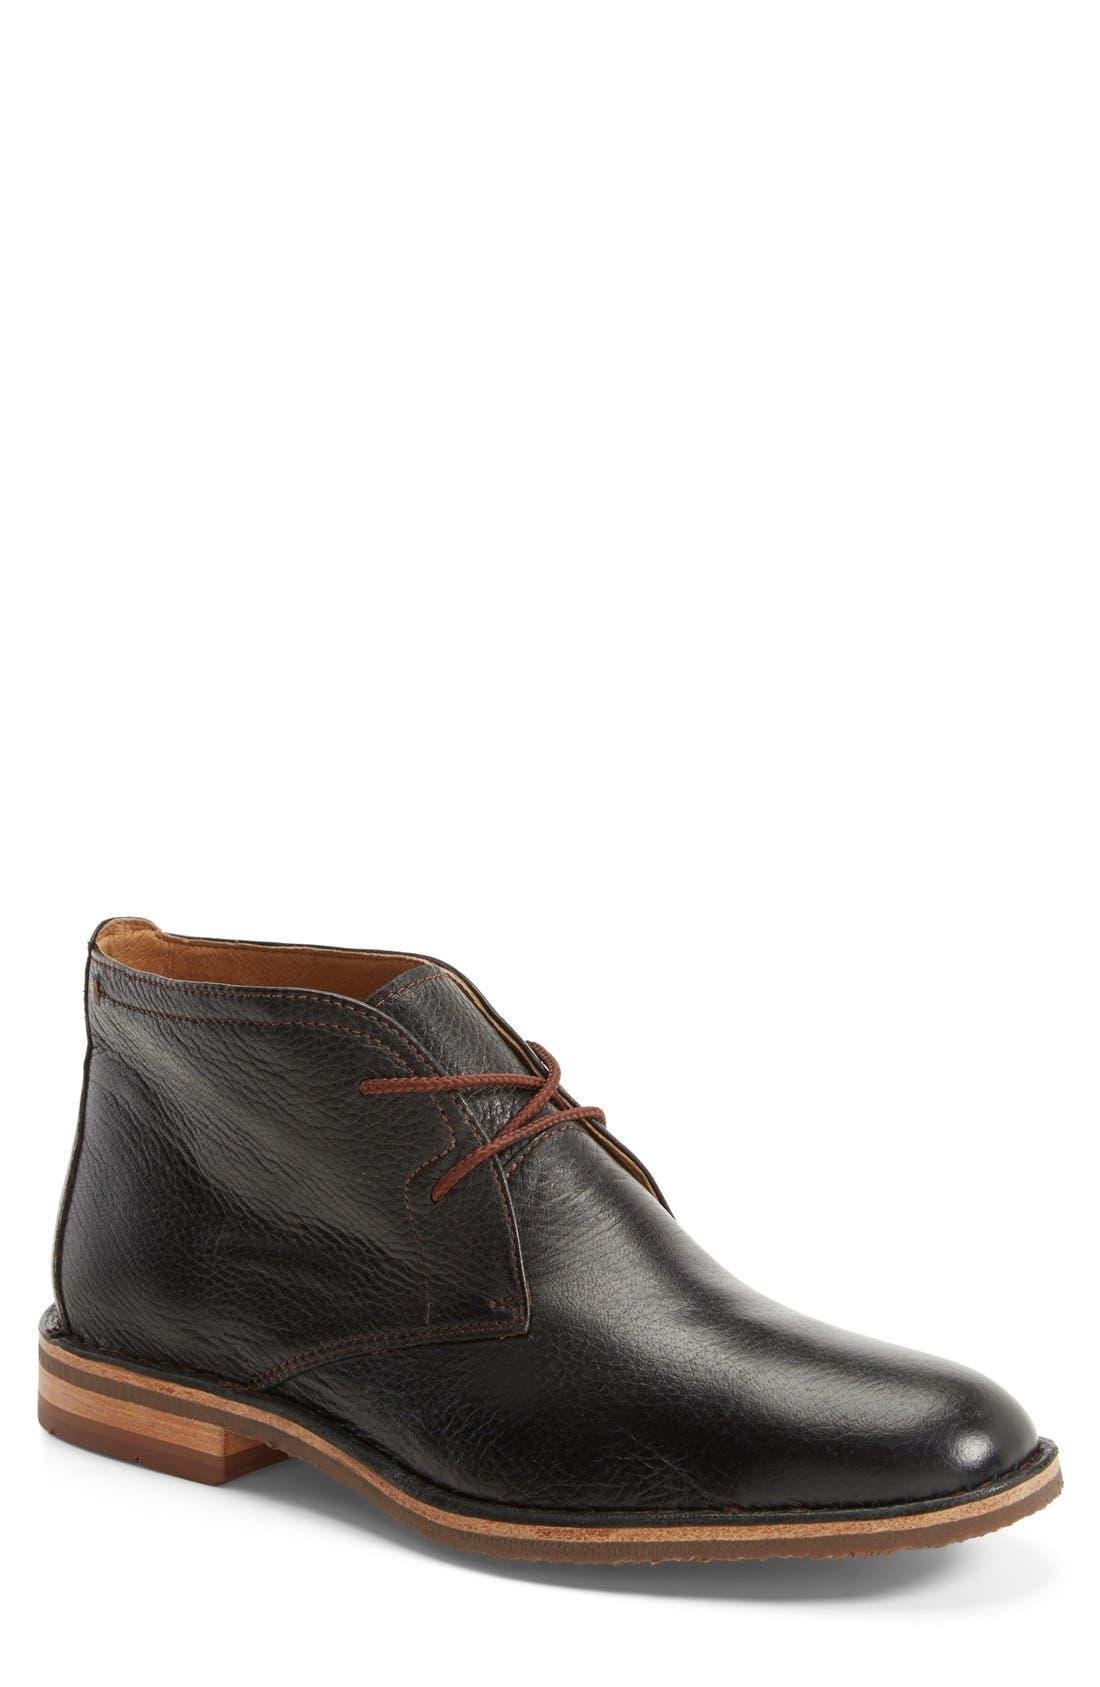 'Brady' Chukka Boot,                         Main,                         color, BLACK NORWEGIAN ELK